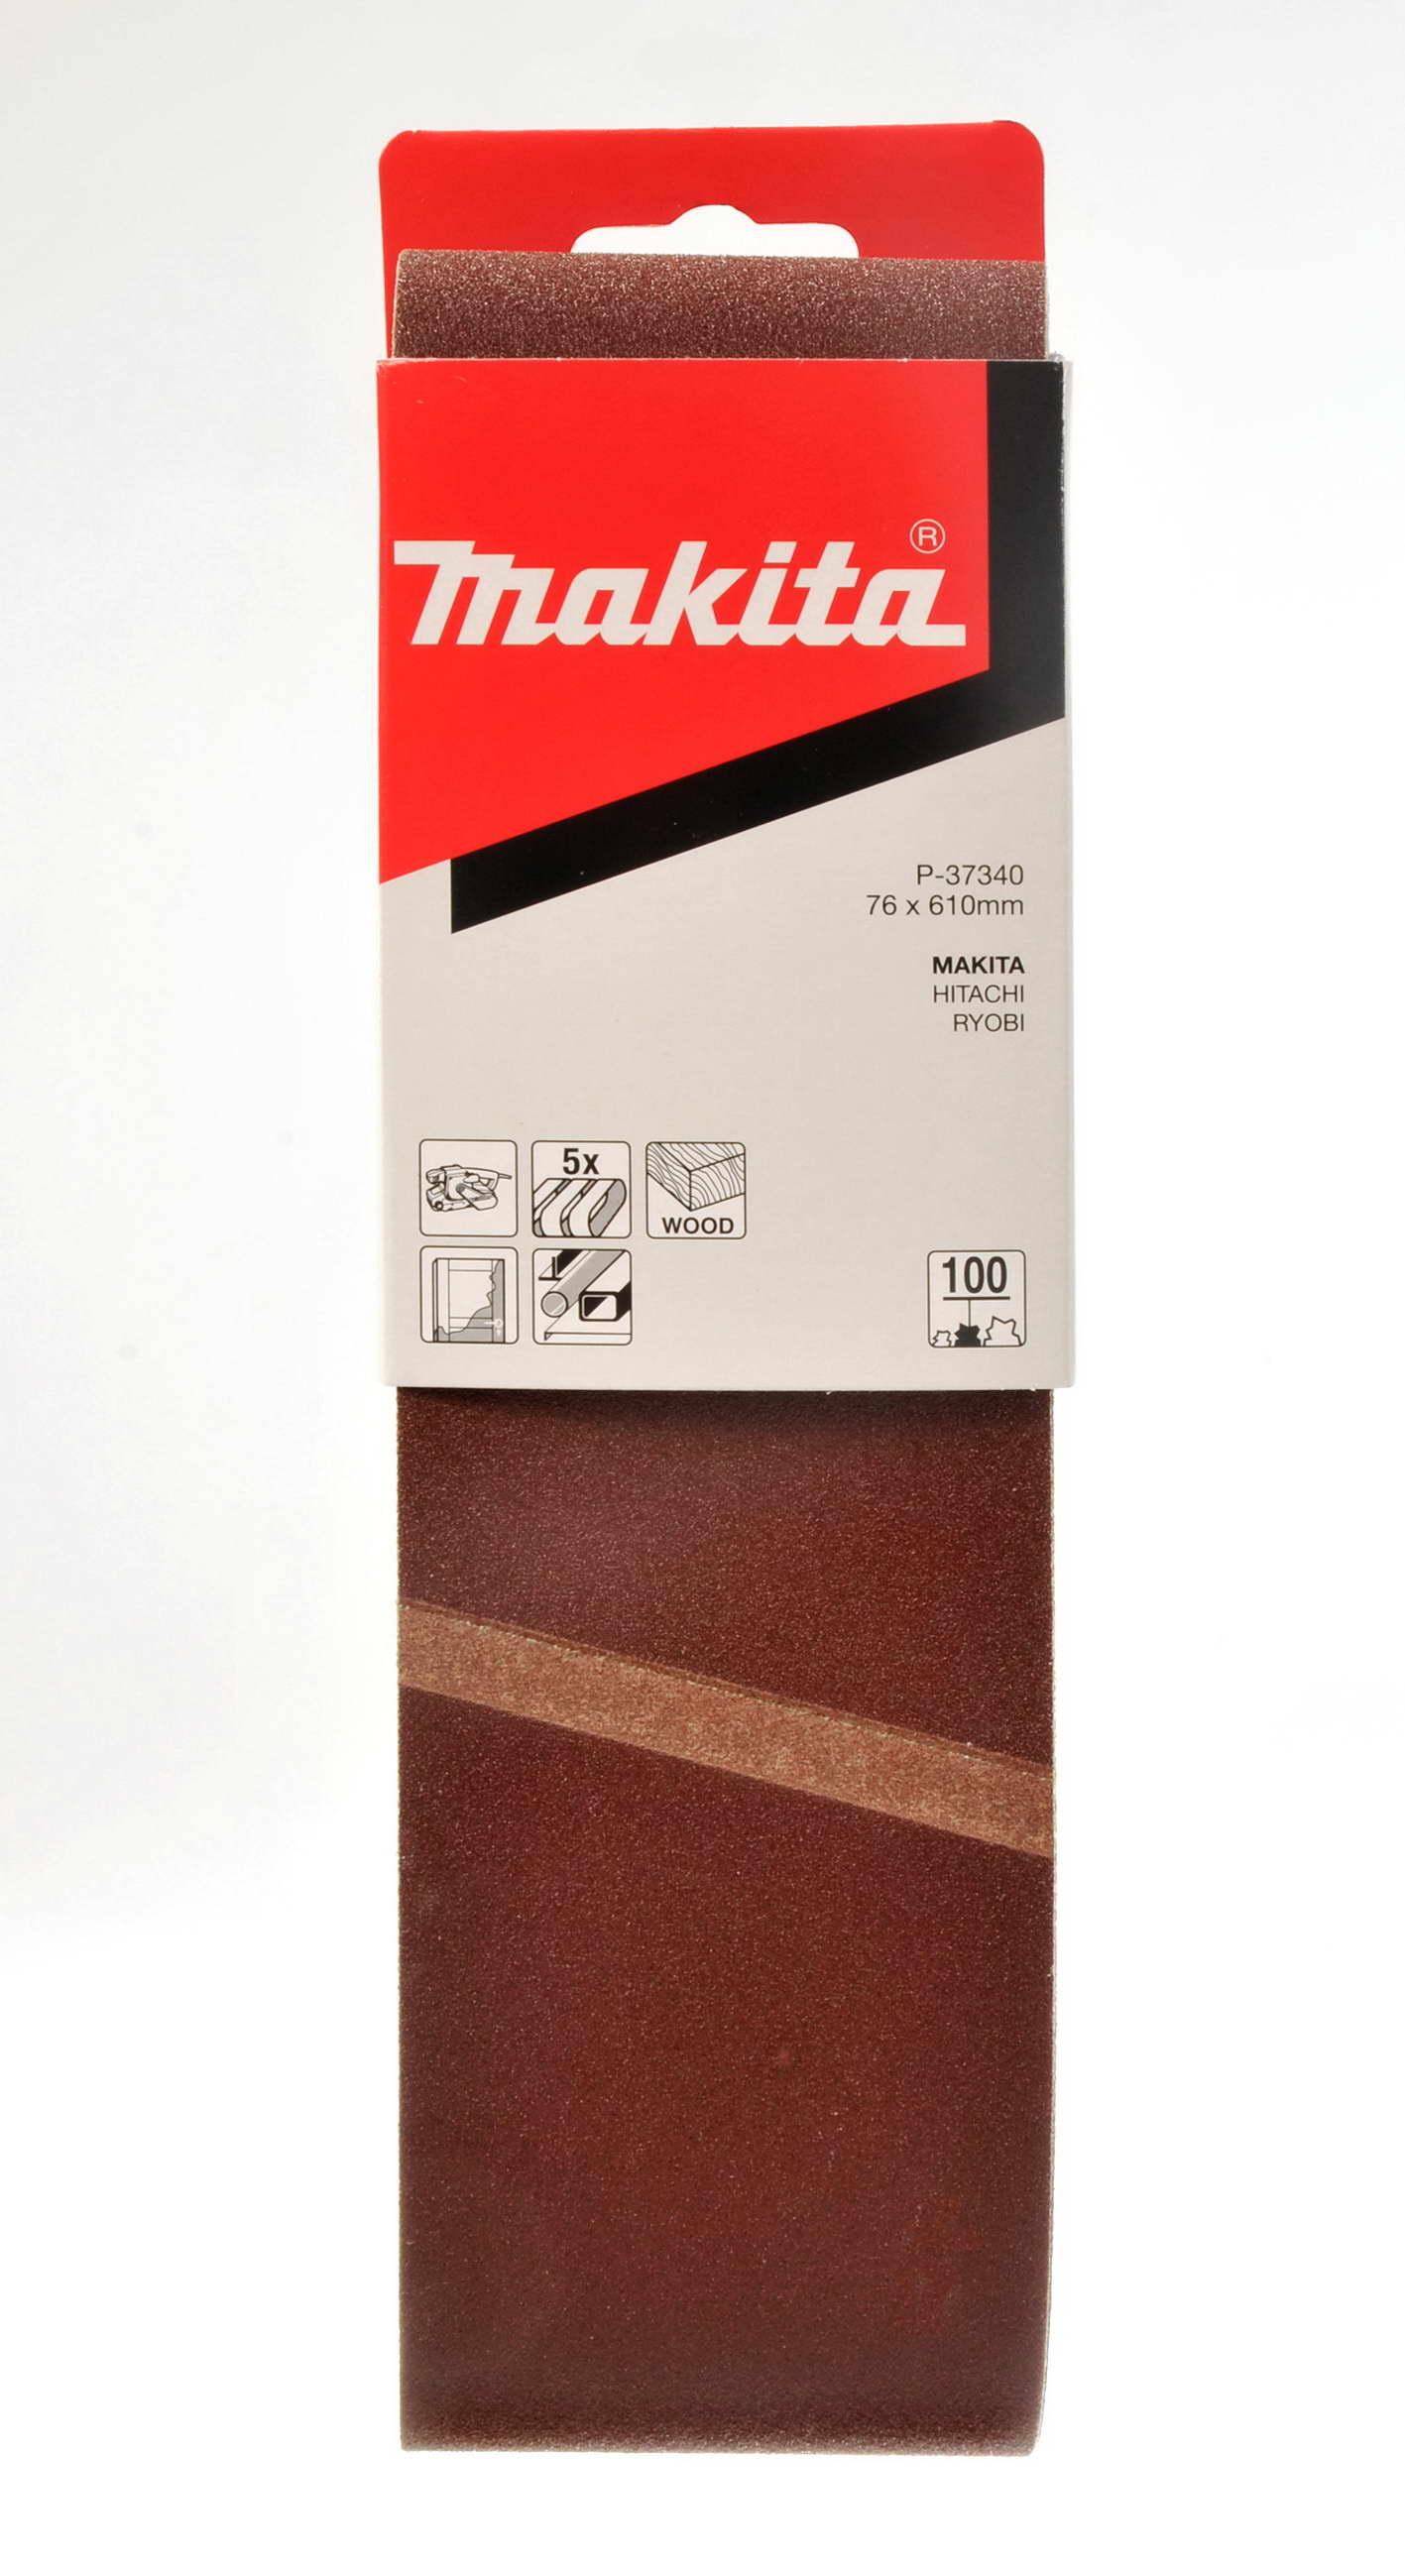 Makita P-37340 brus.pásy76x610mmK100 5ks